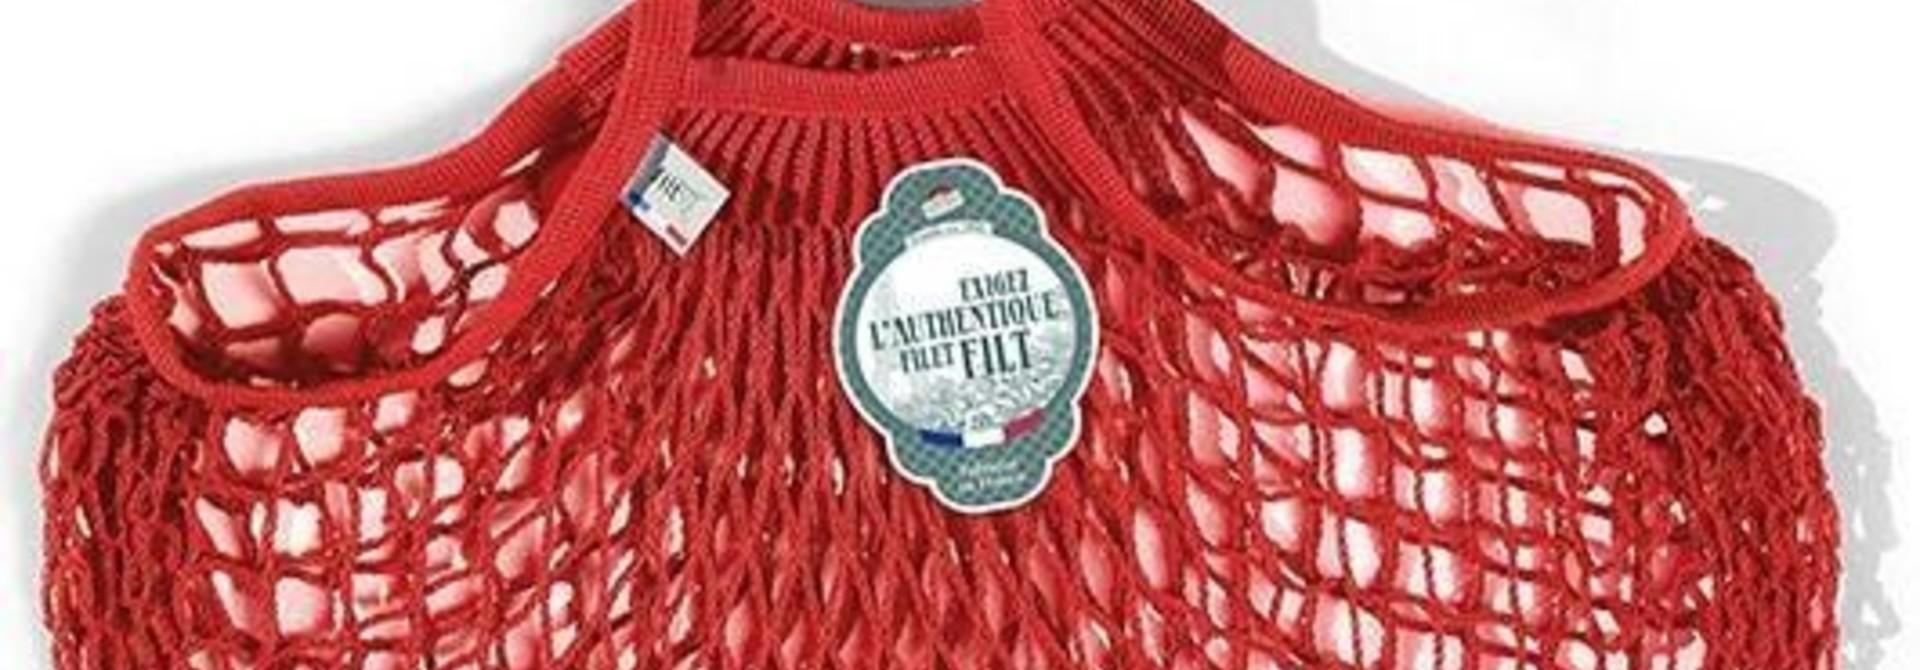 Filt Woven Cotton Bag - Poppy